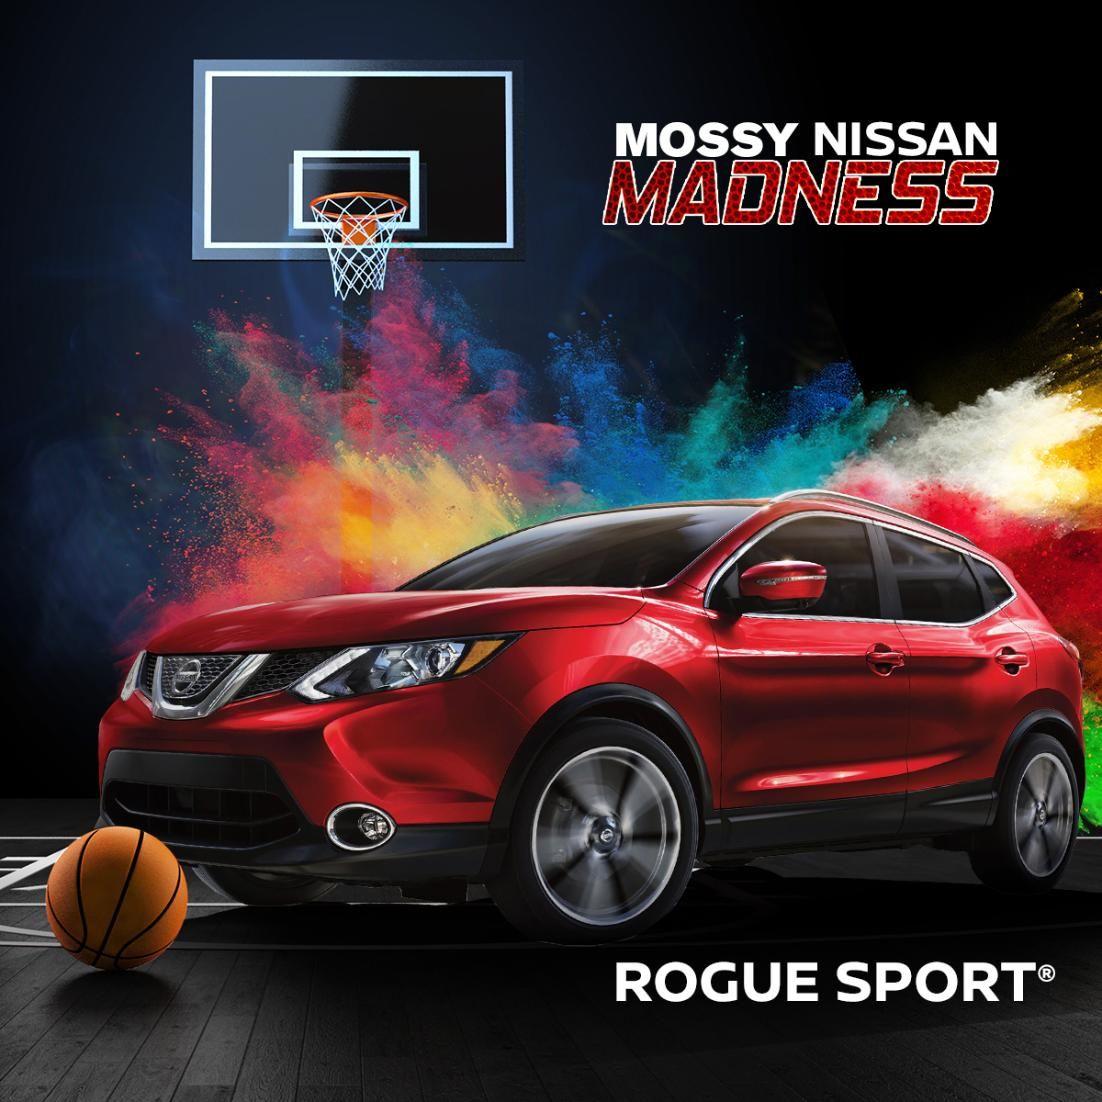 Madness Nissan, Nissan rogue, Instagram